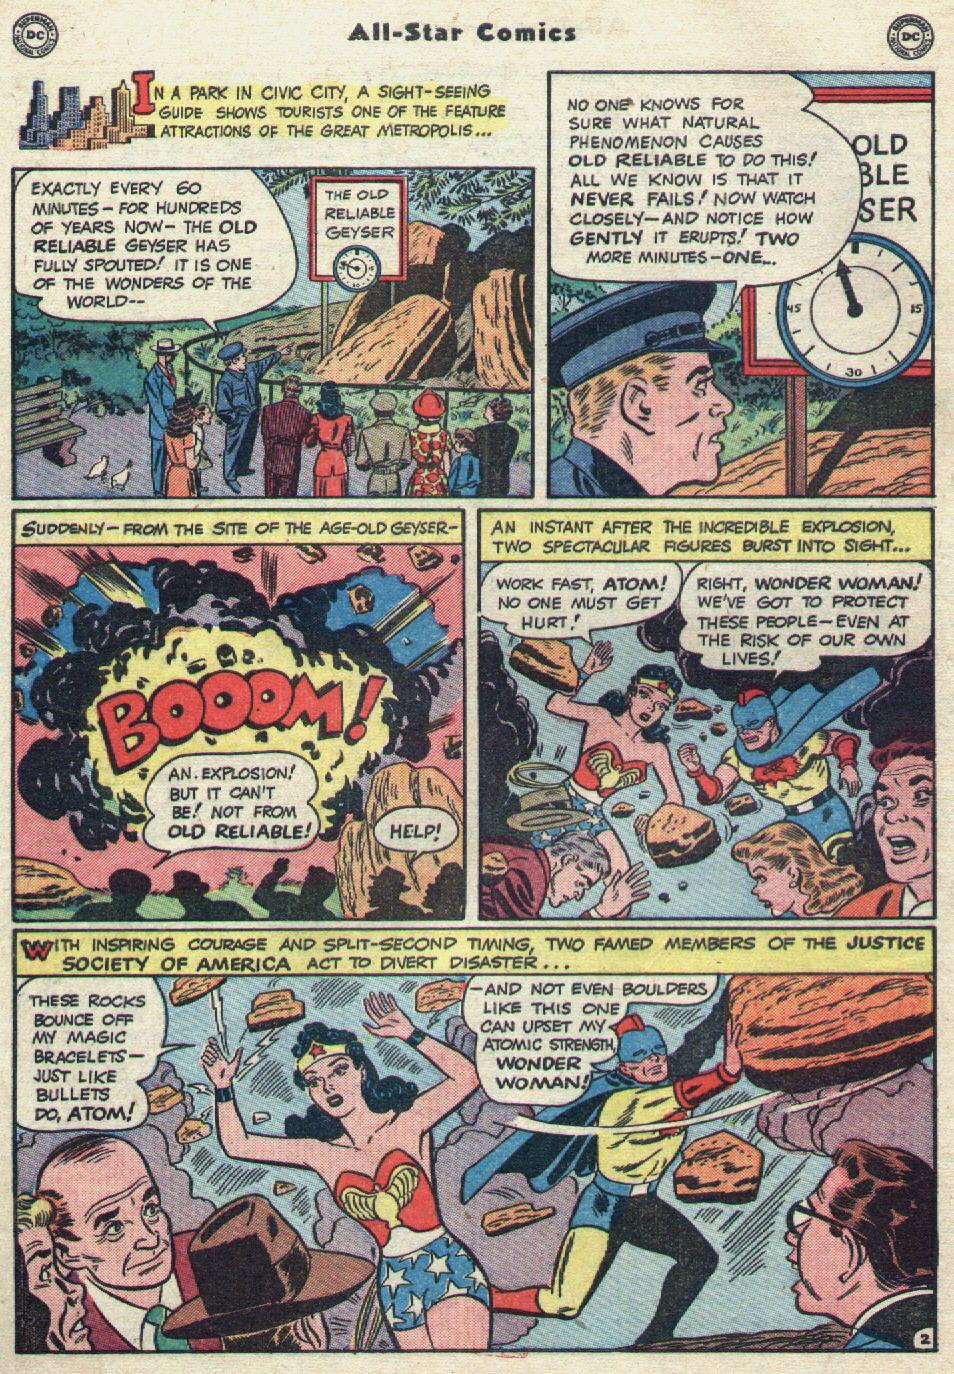 Read online All-Star Comics comic -  Issue #51 - 4